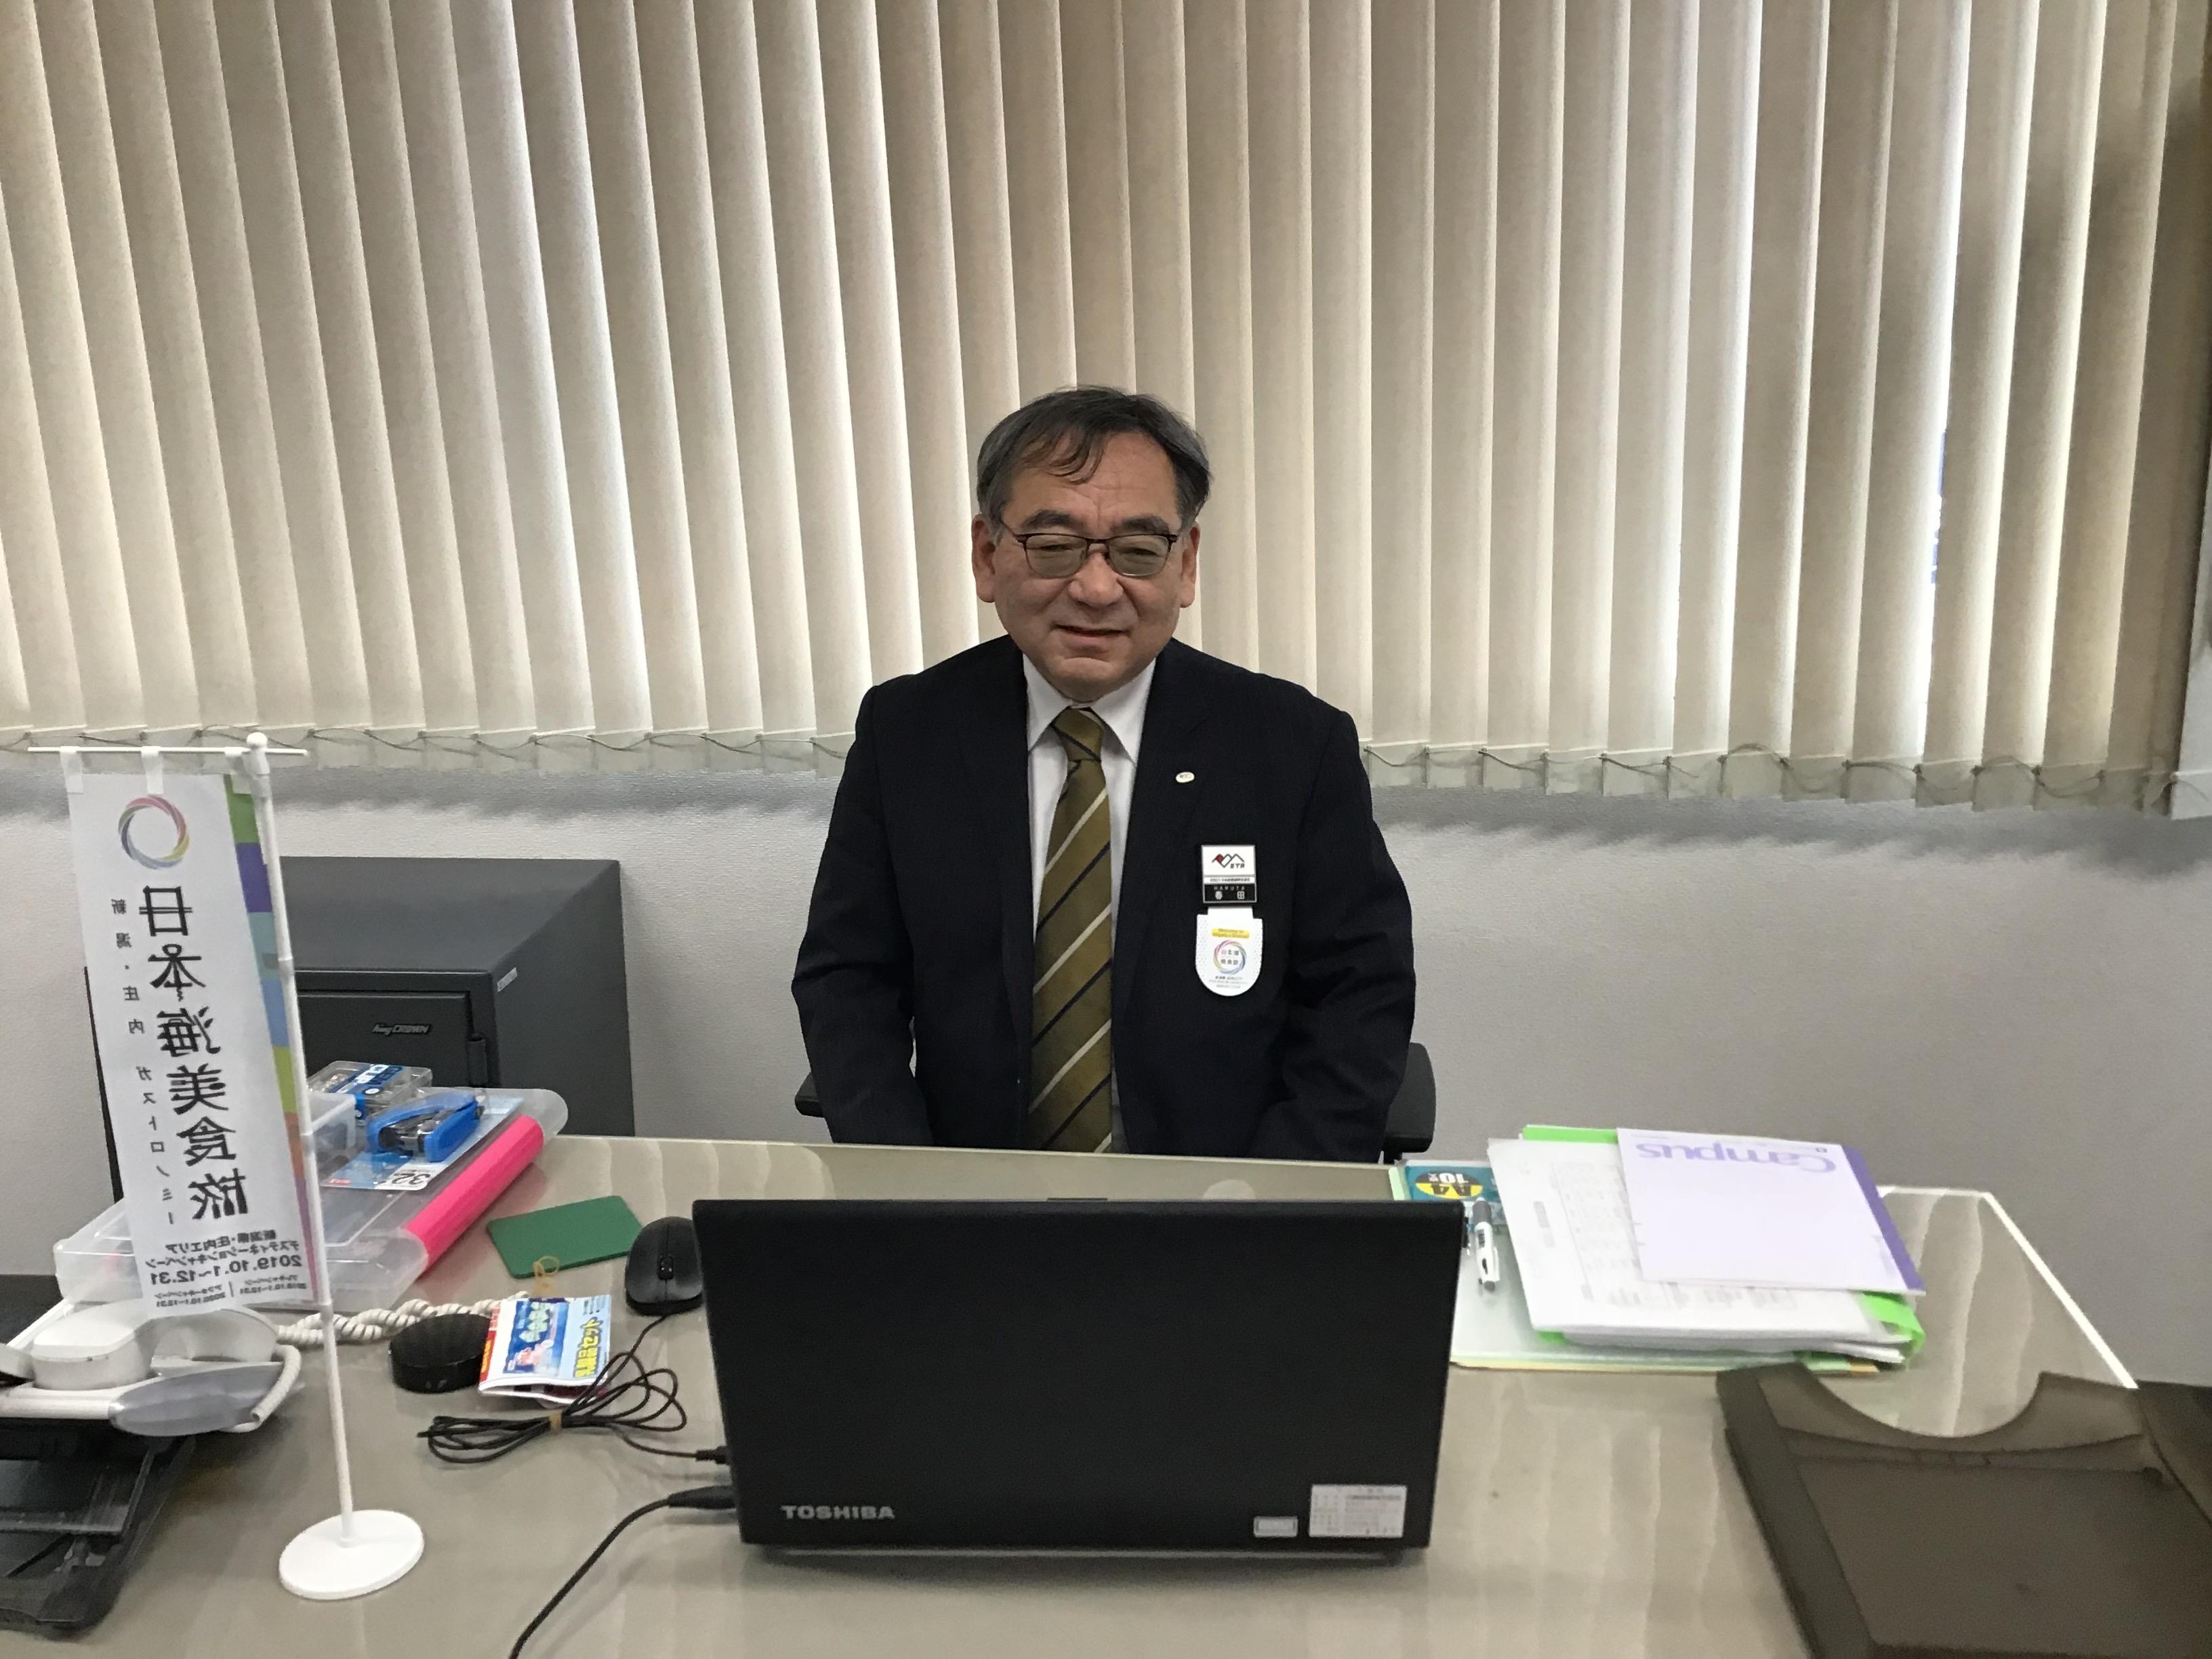 トキ鉄新営業部長に春田啓郎氏就任